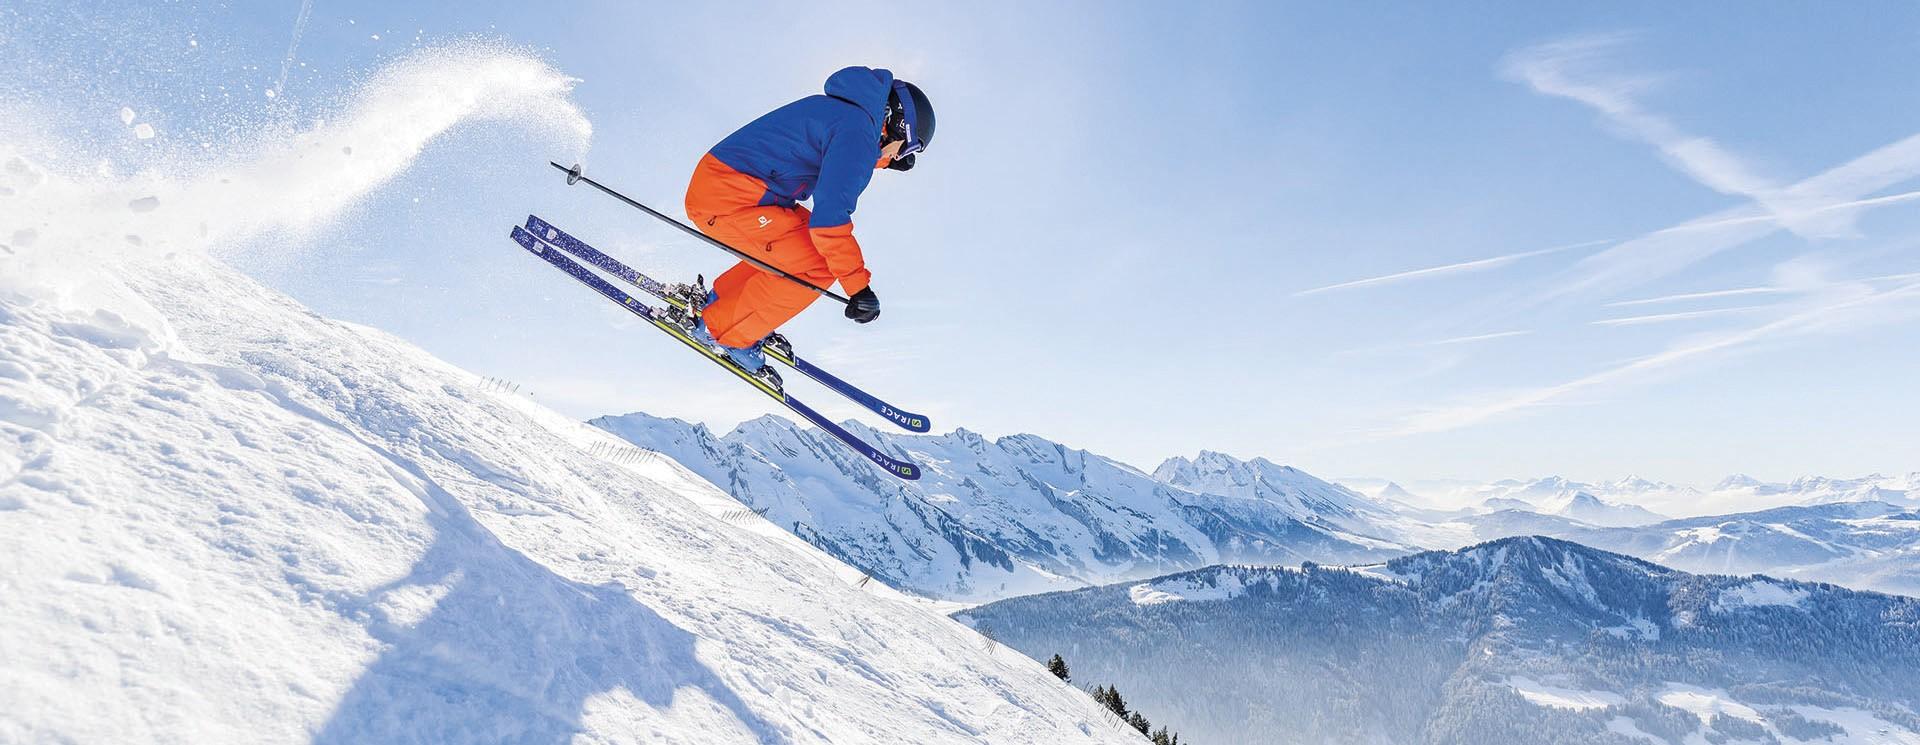 ski-h2019-ot-le-grand-bornand-alpcat-medias-34i8260-web-1920x745-200681